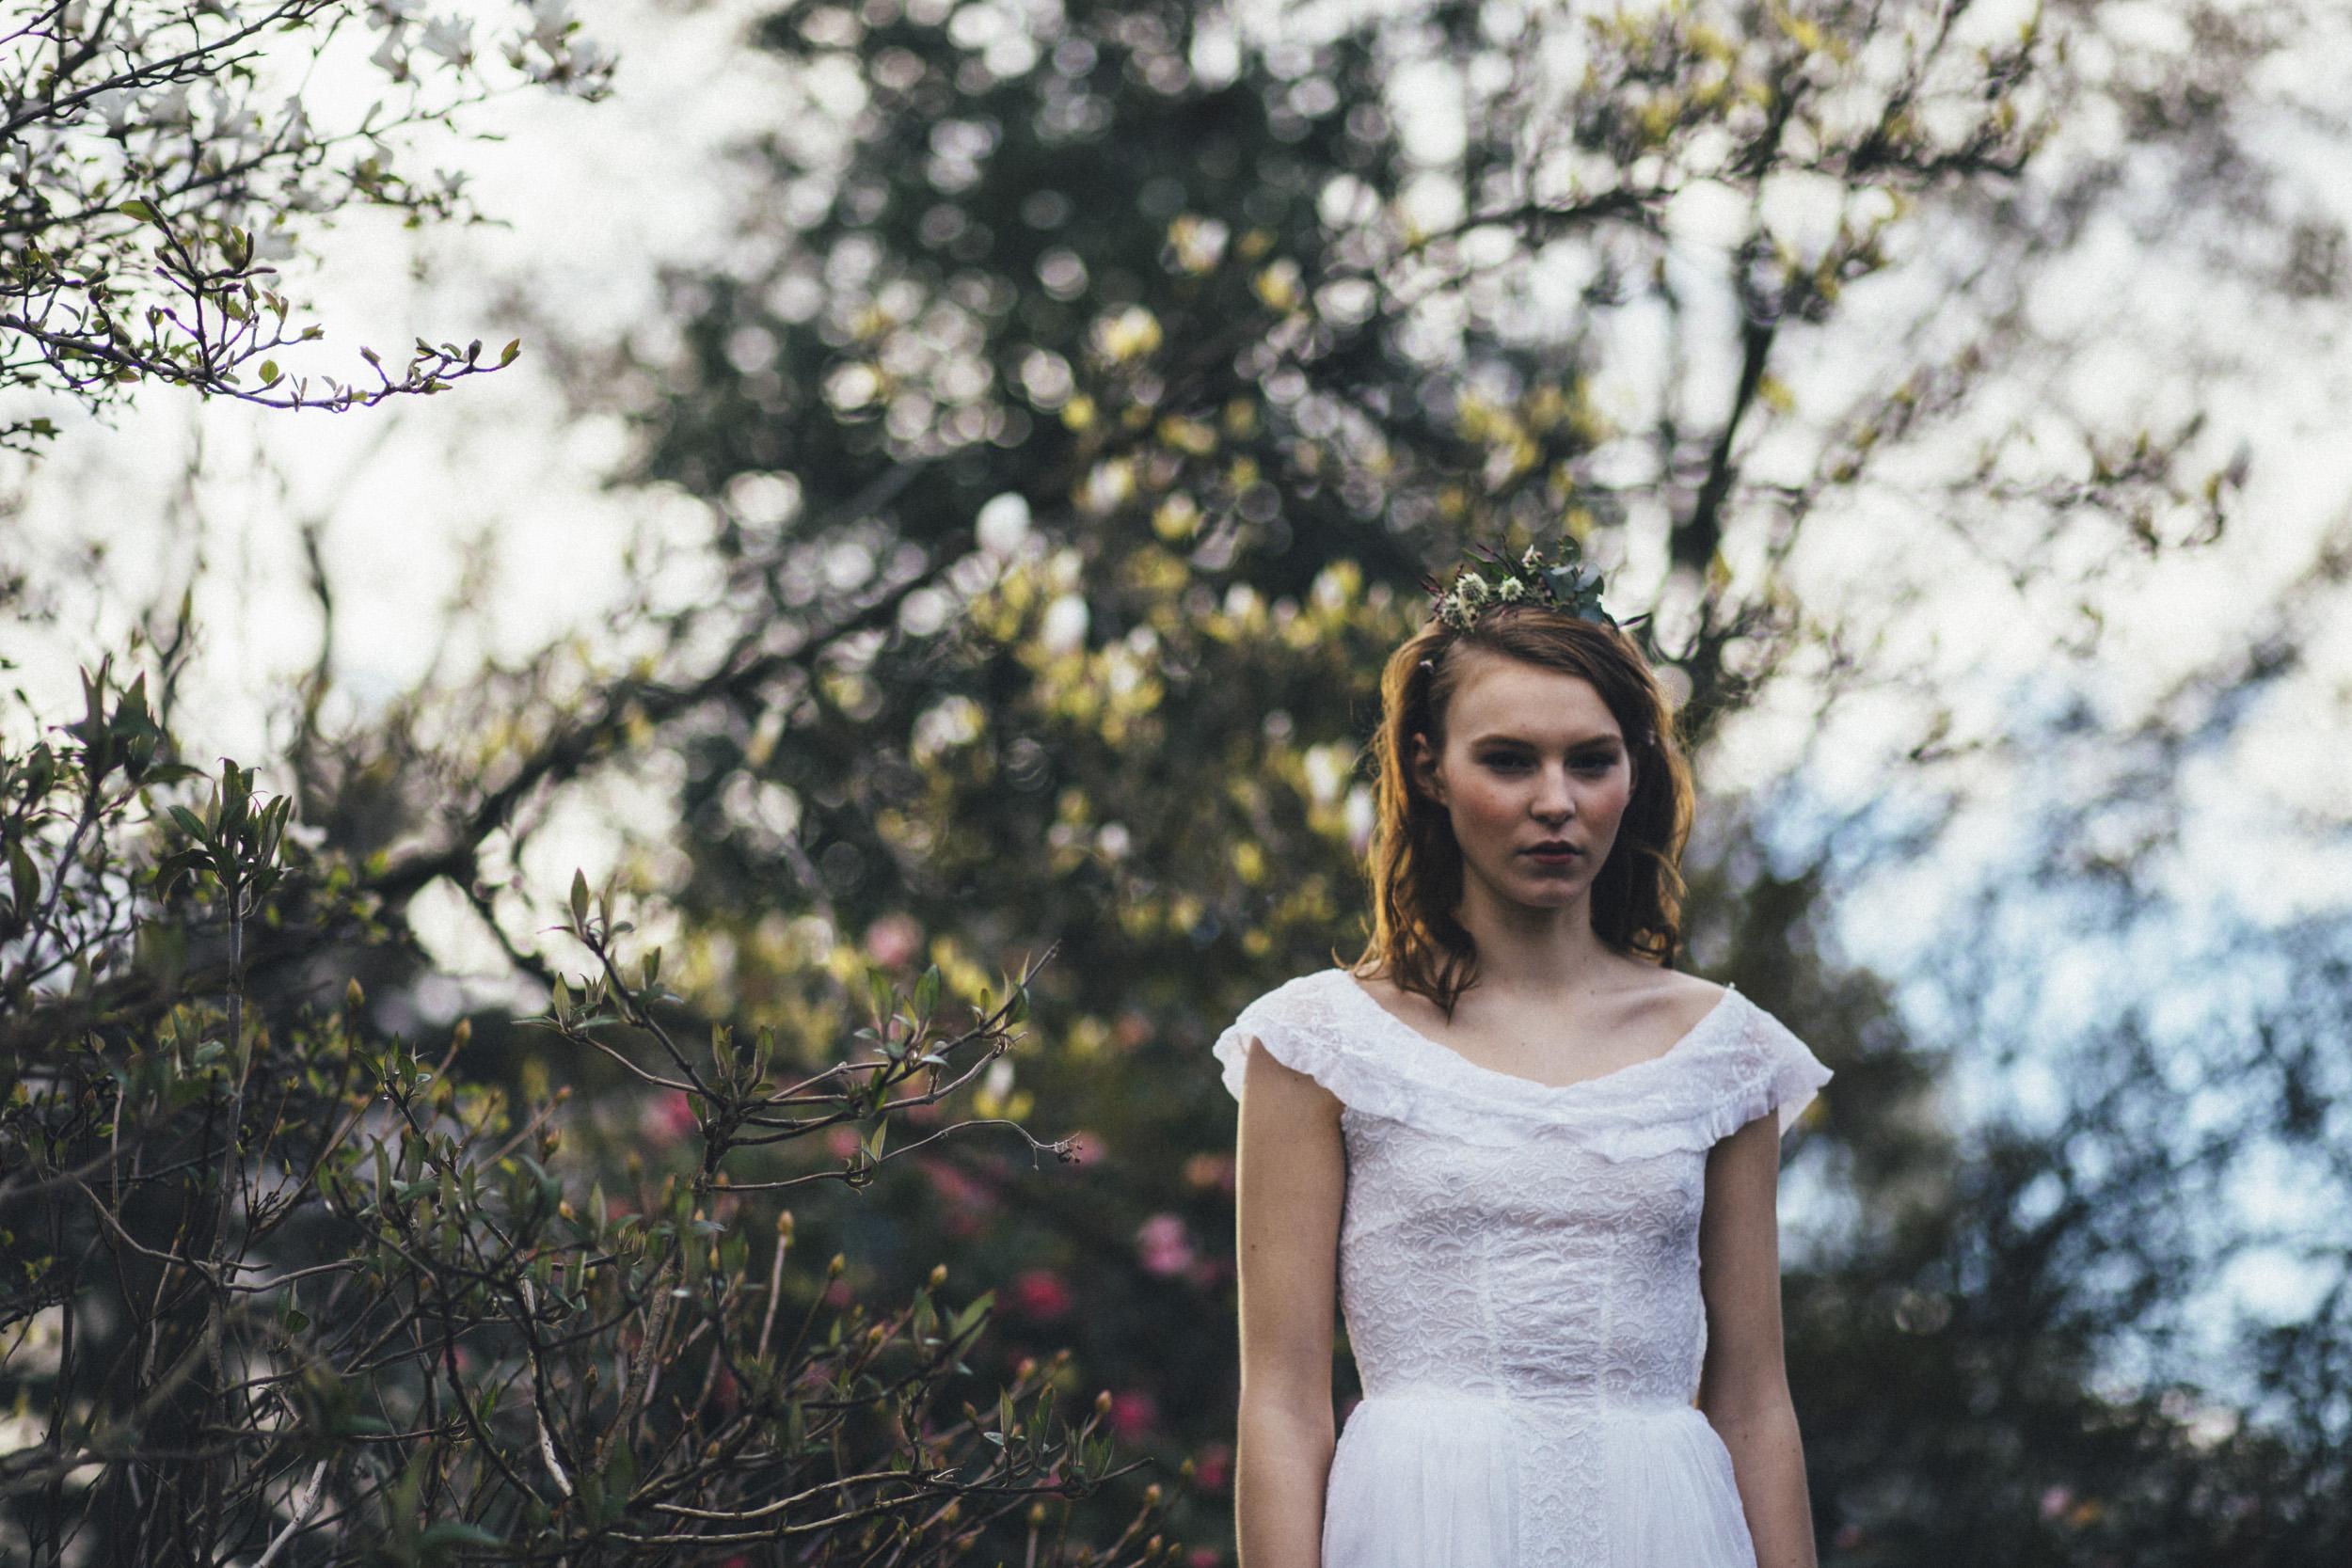 Spring-Bridal-Kate-Beaumont-Shelley-Richmond-Vintage-Wedding-Dress-15.jpg